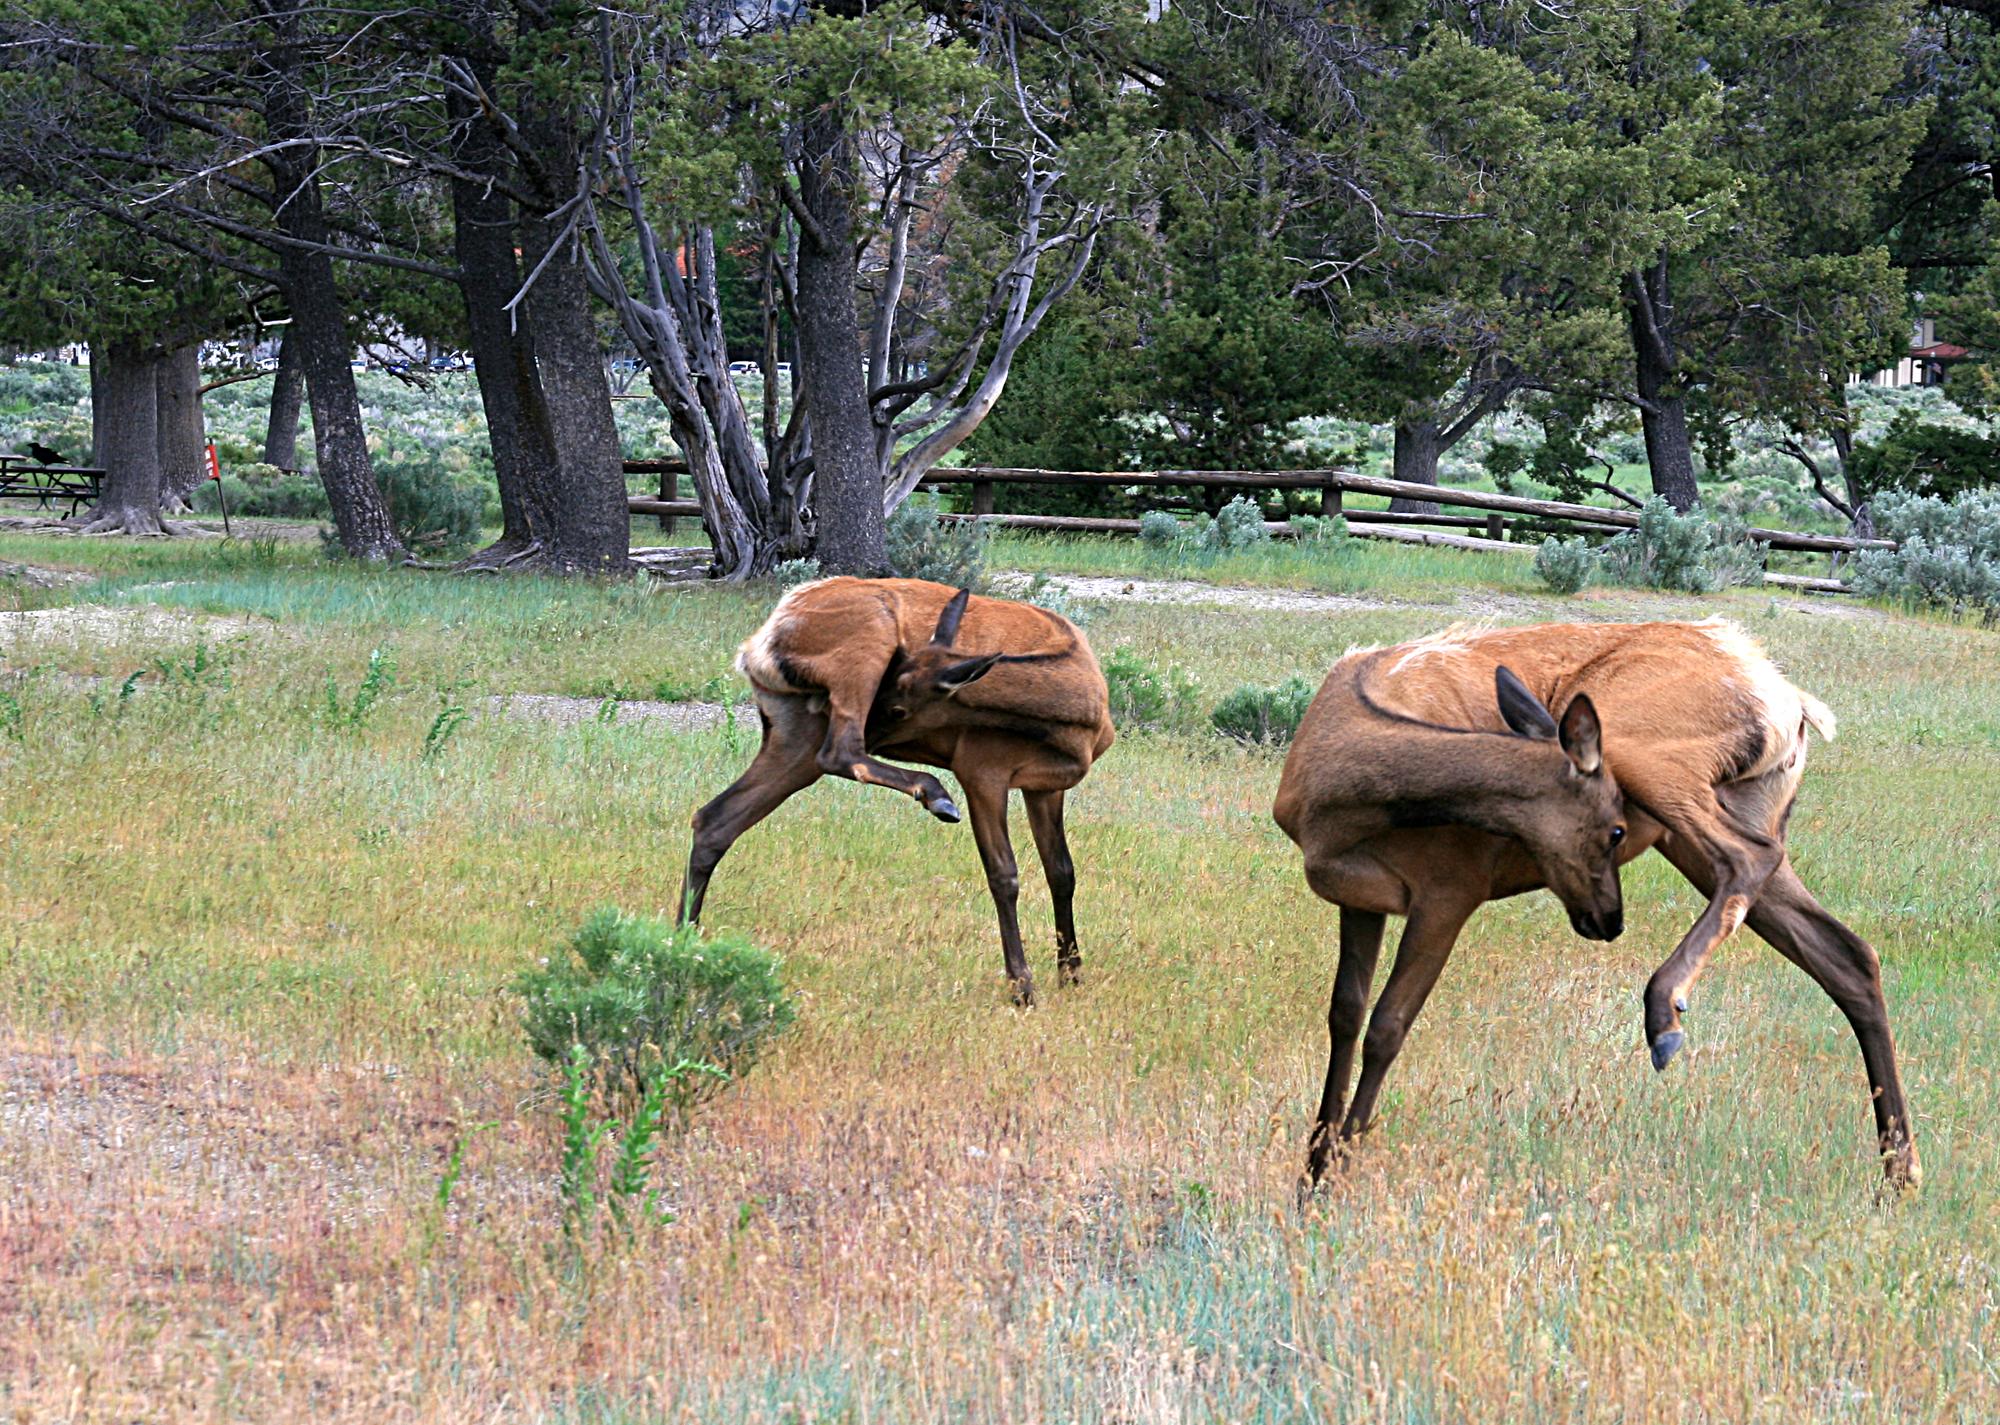 Elks_in_yellowstone_national_park.jpg